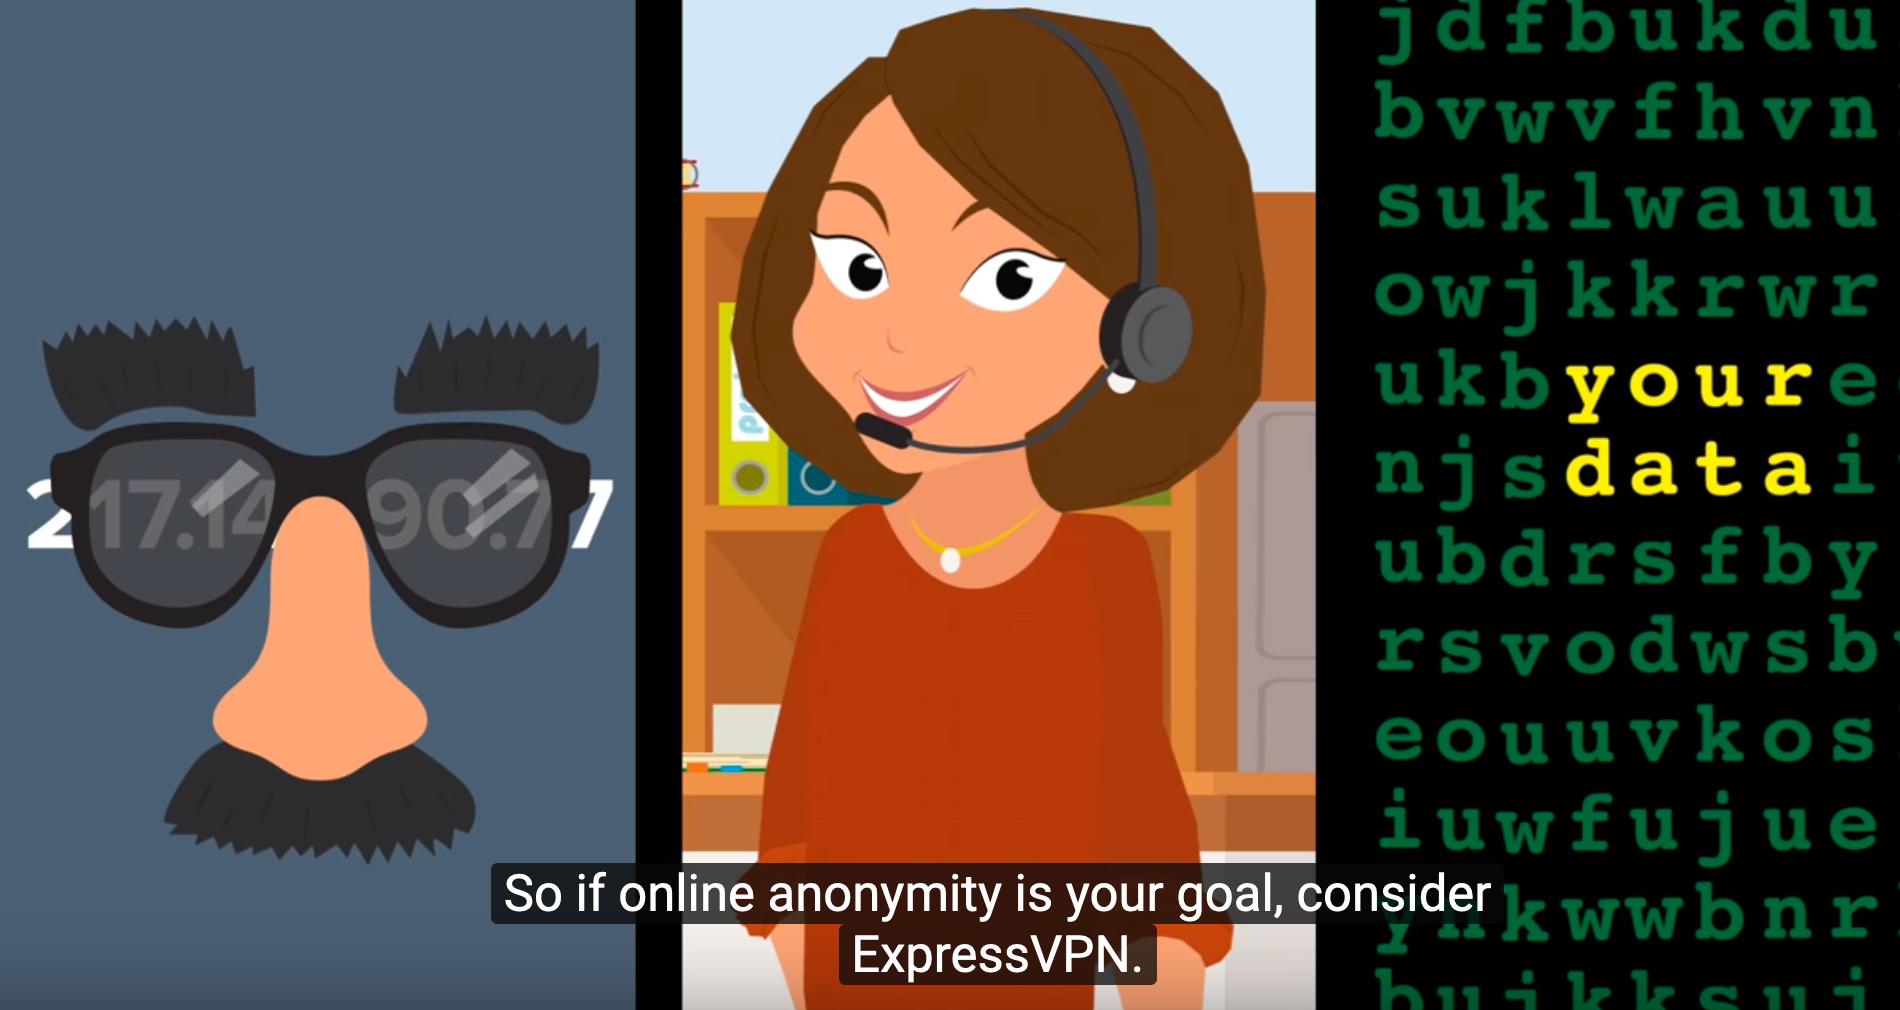 expressvpn promise of anonymity